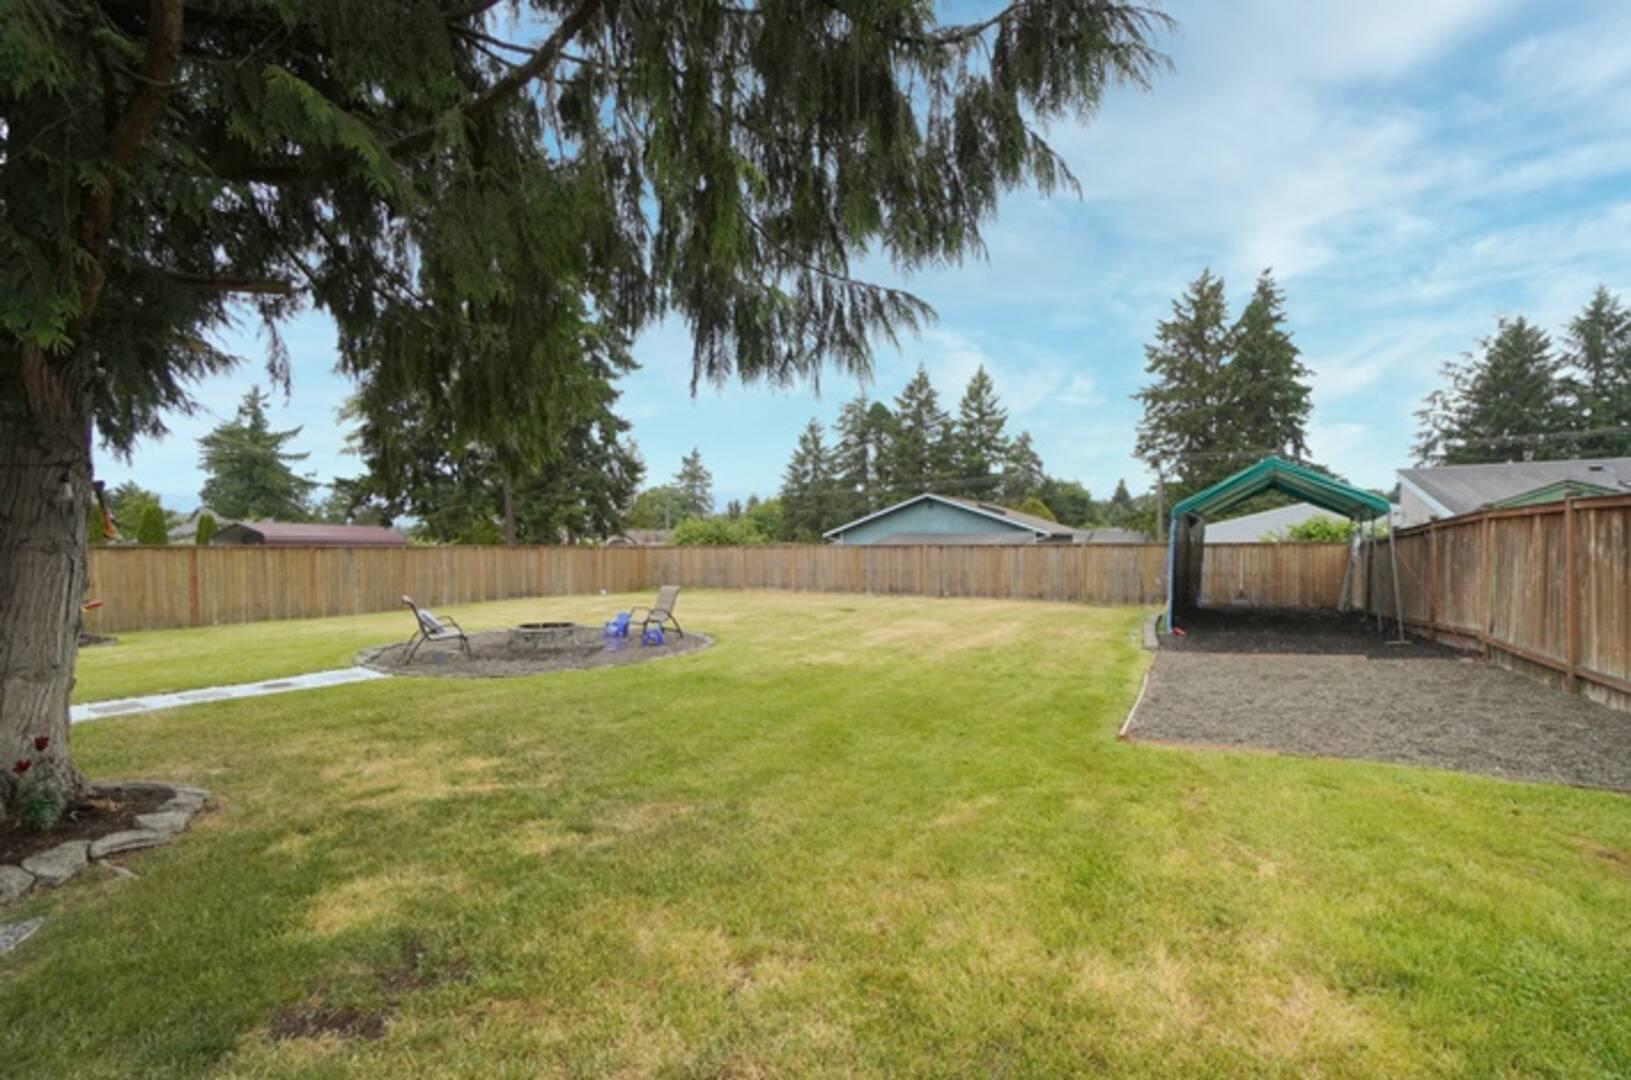 703 140th St S Tacoma, WA 98444